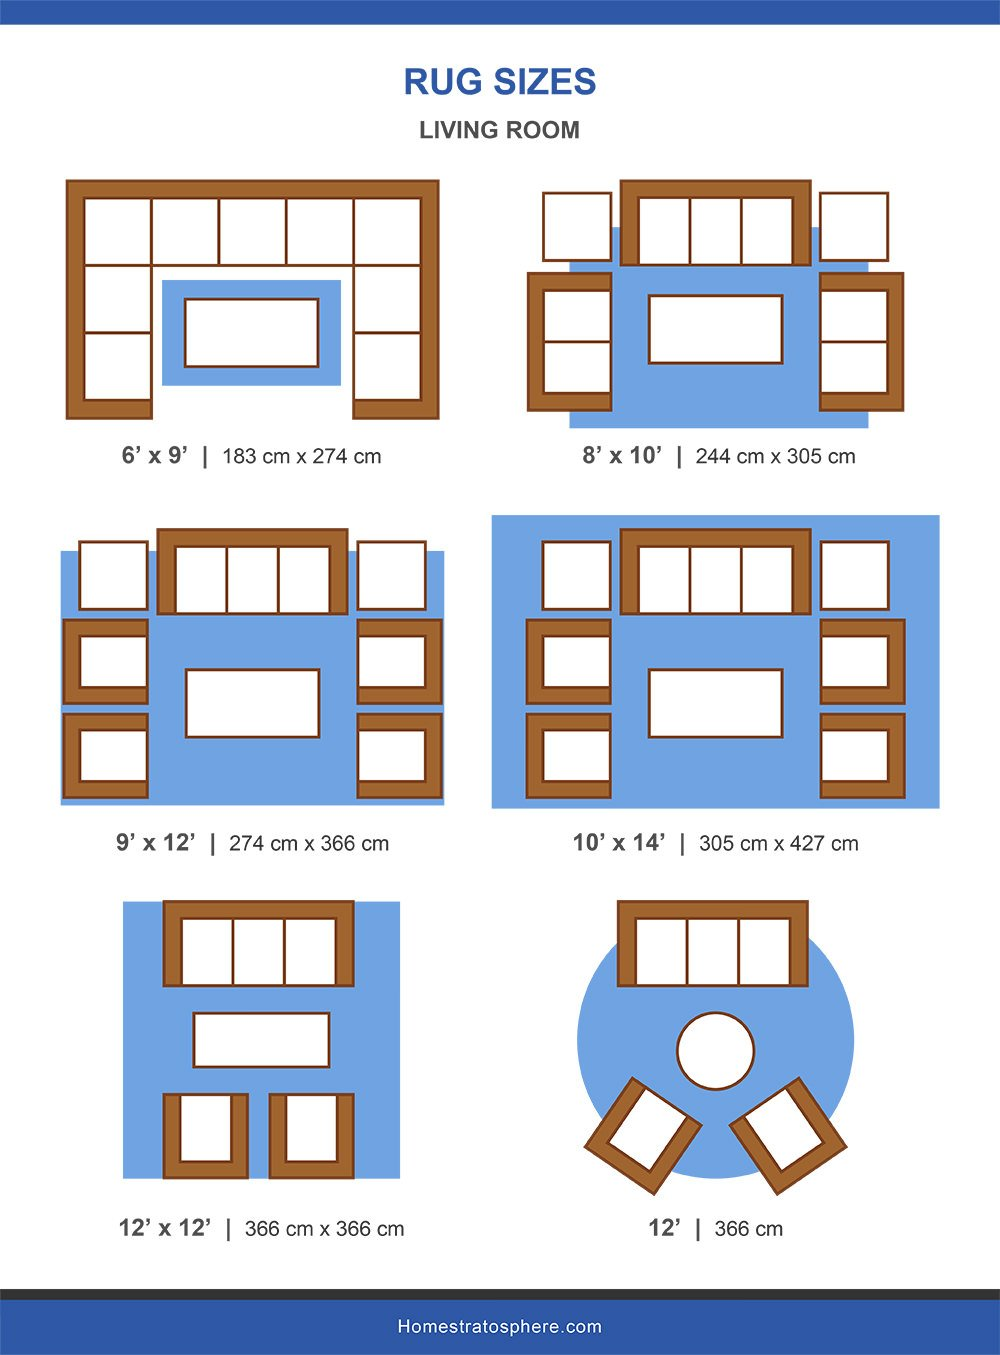 Living Room Rug Size Chart